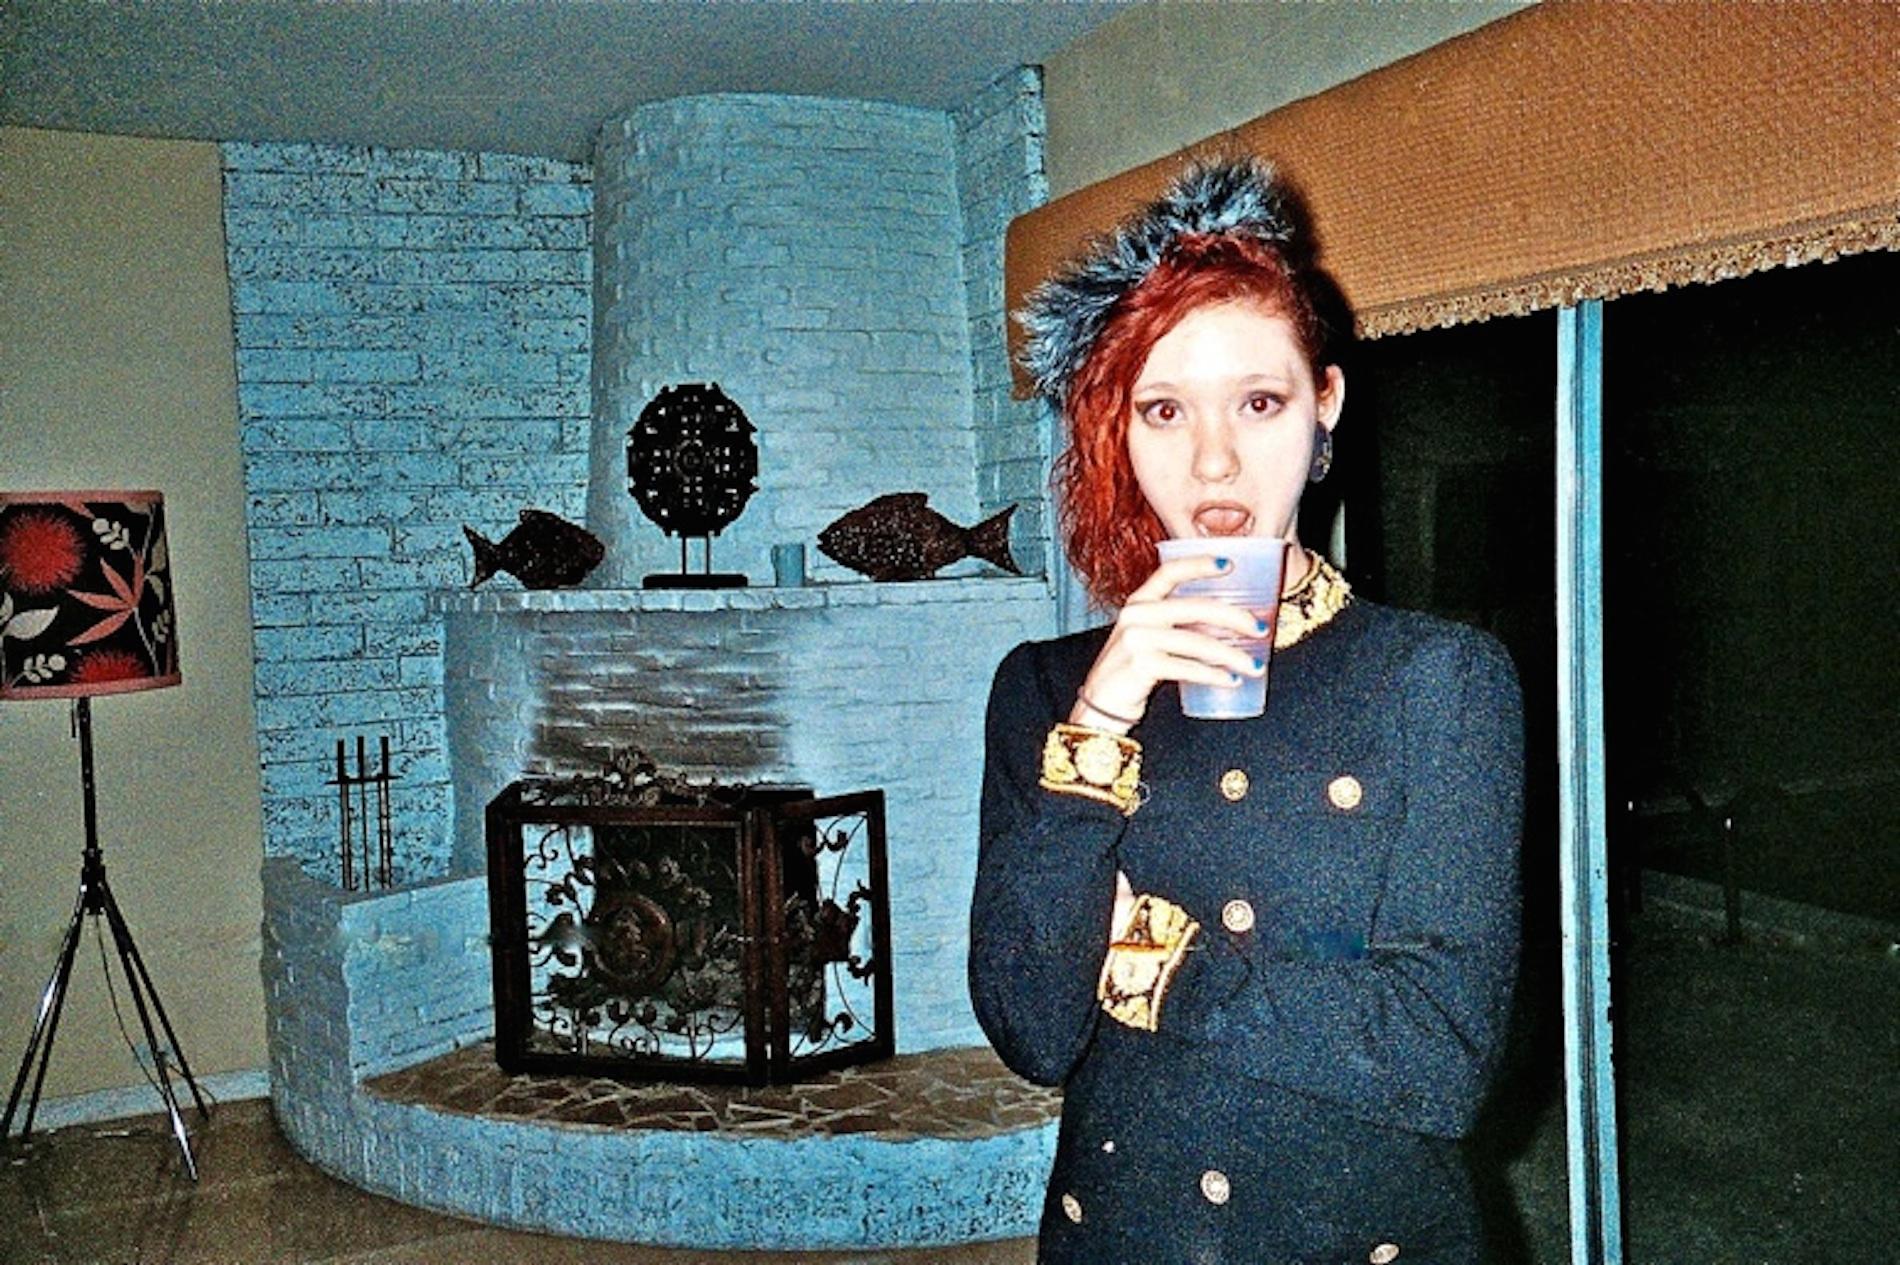 lindsay-dye-photography-art-ashley.jpg